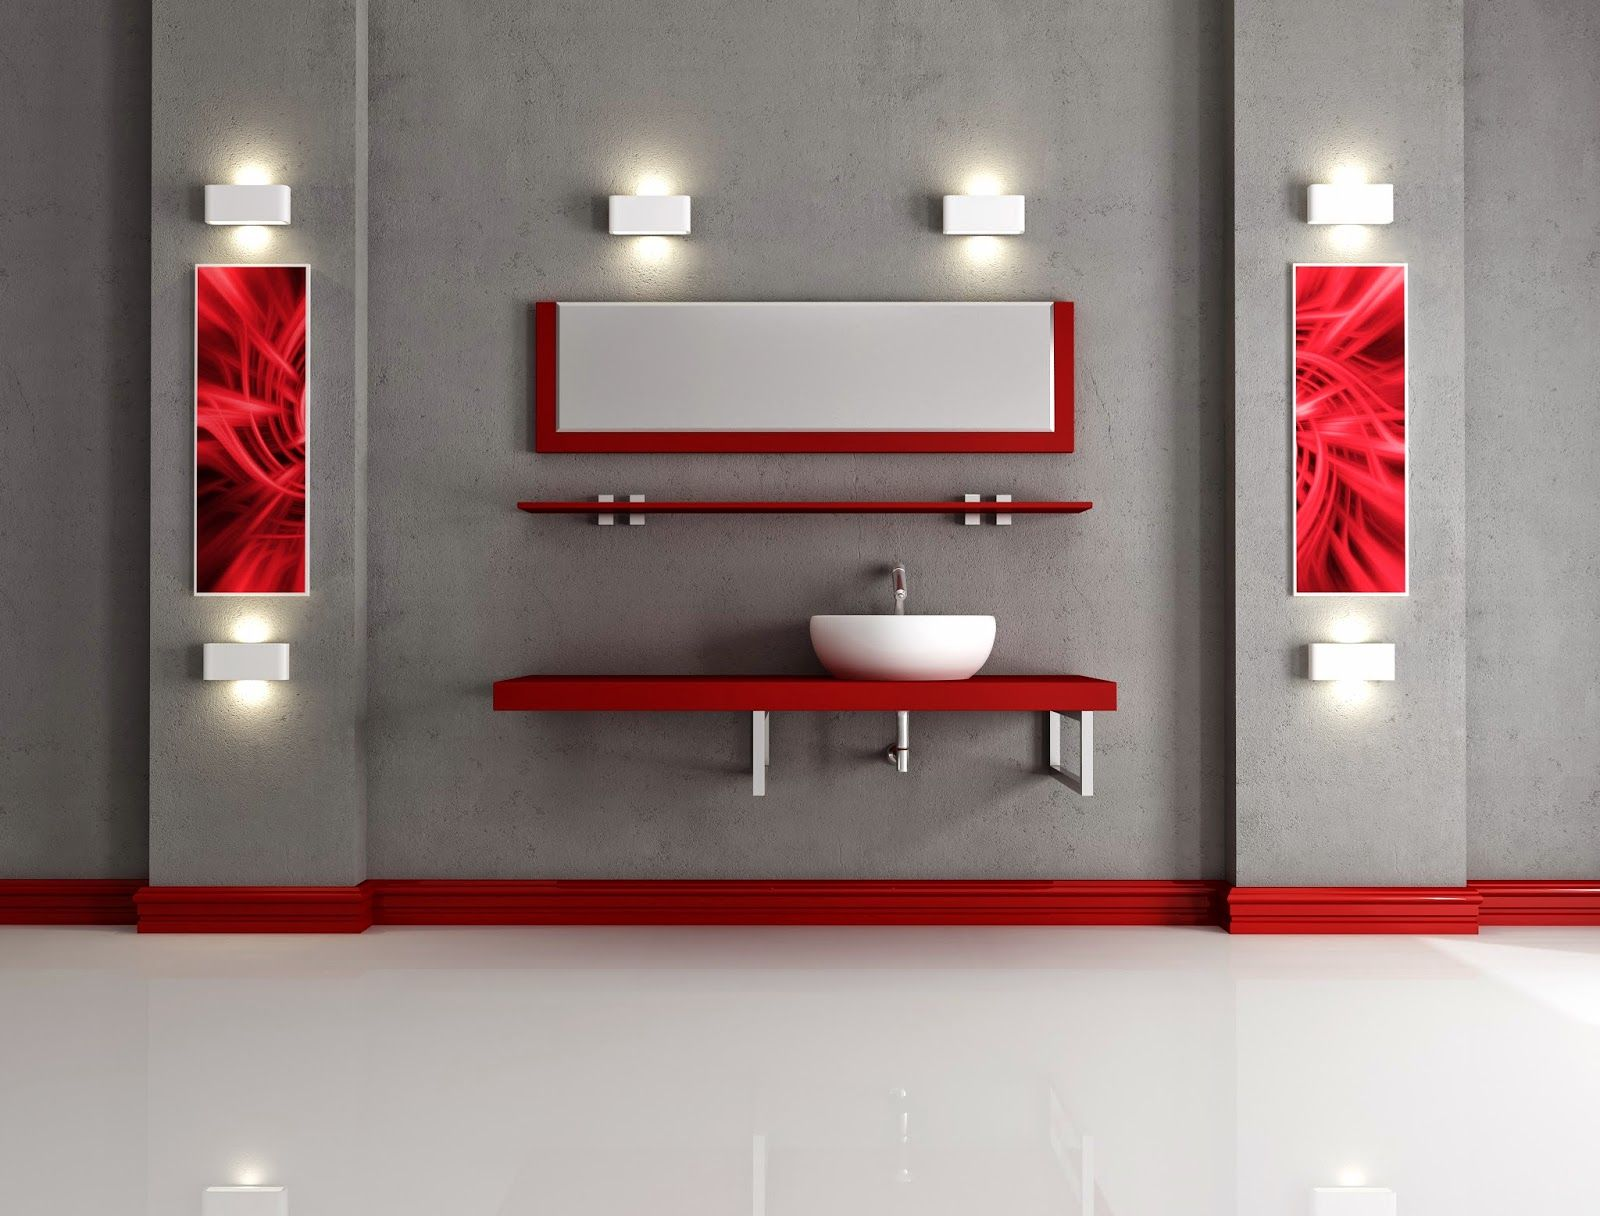 Decoration Tile Beauteous Bed & Bath Bathroom Remodels Ideas With Tile Flooring And Bathtub Inspiration Design